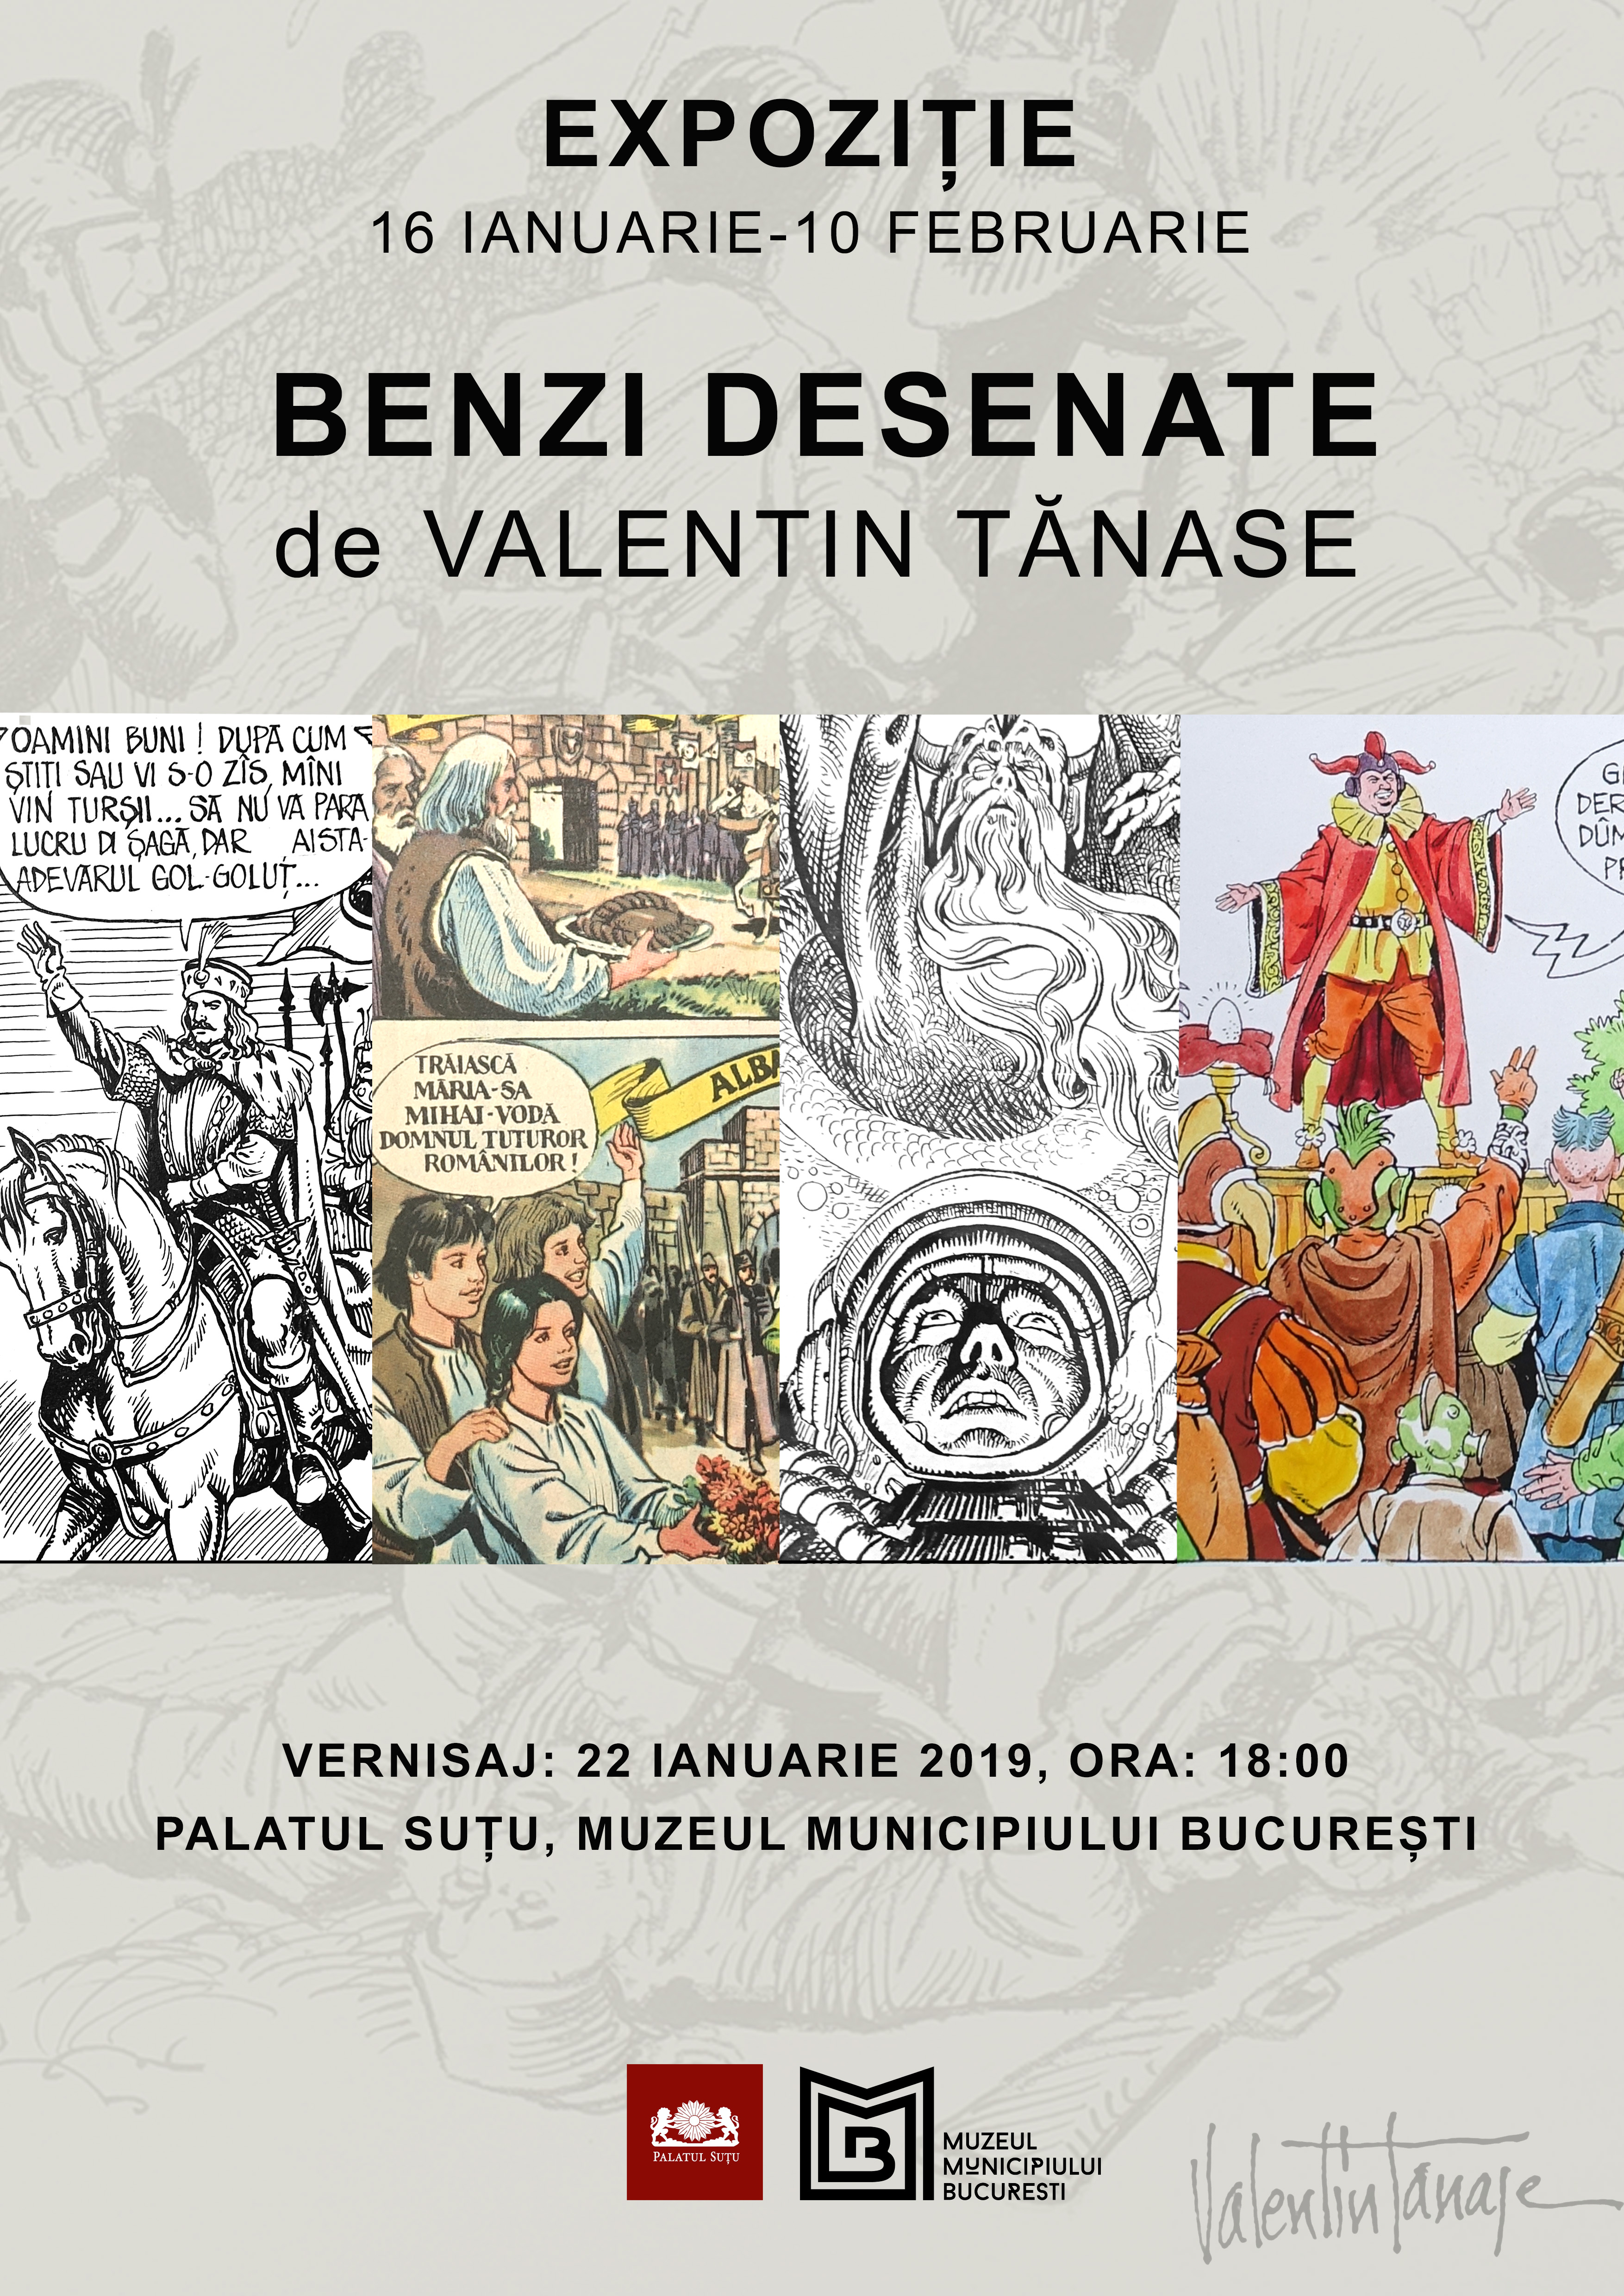 Benzi desenate de Valentin Tănase